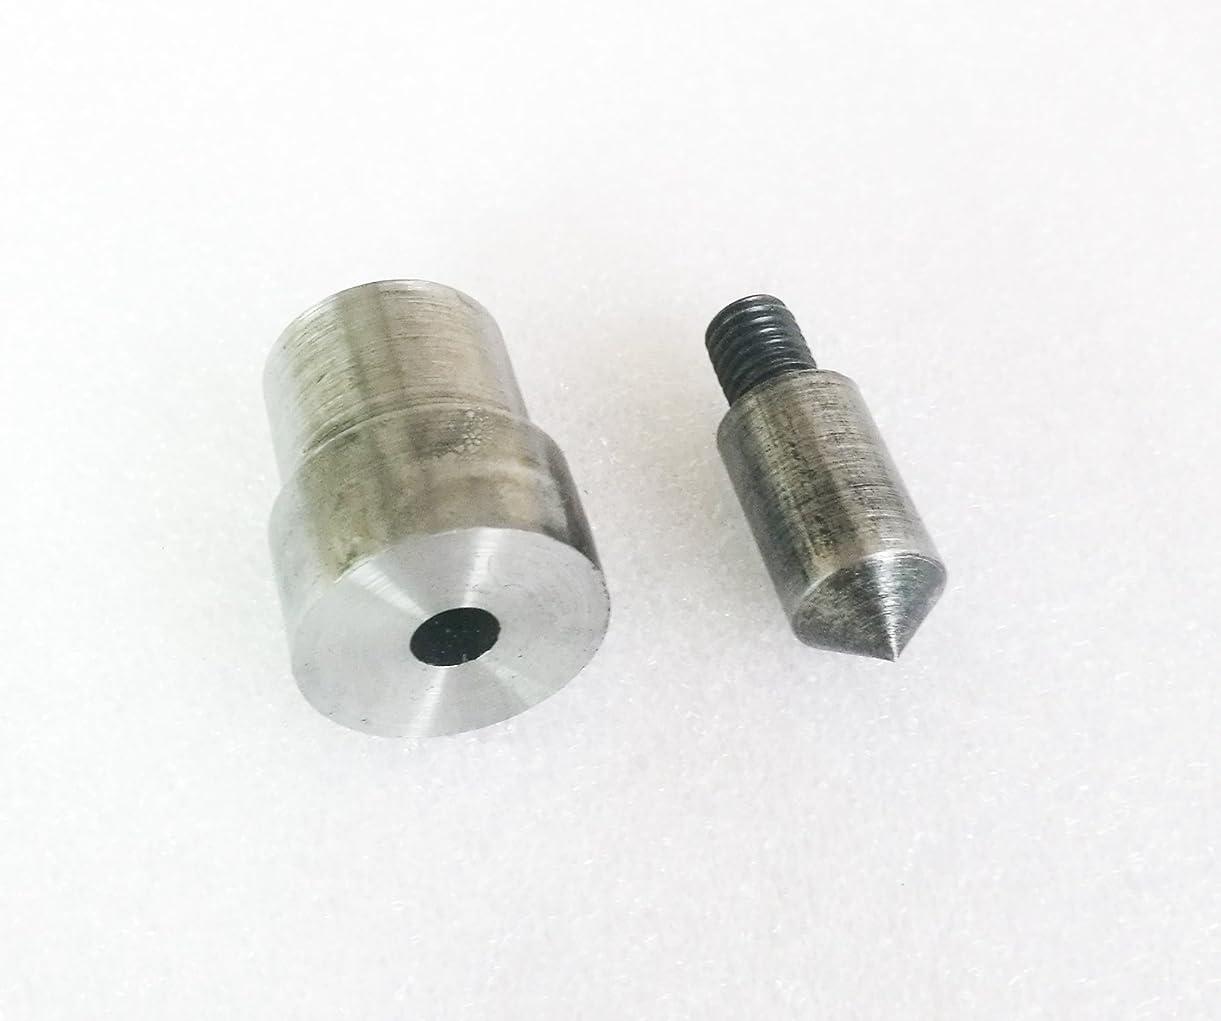 Handmade Manual Press Machine Hole Setter Punch Puncher Tools Dies 4-20mm (3mm diameter) eenln3340